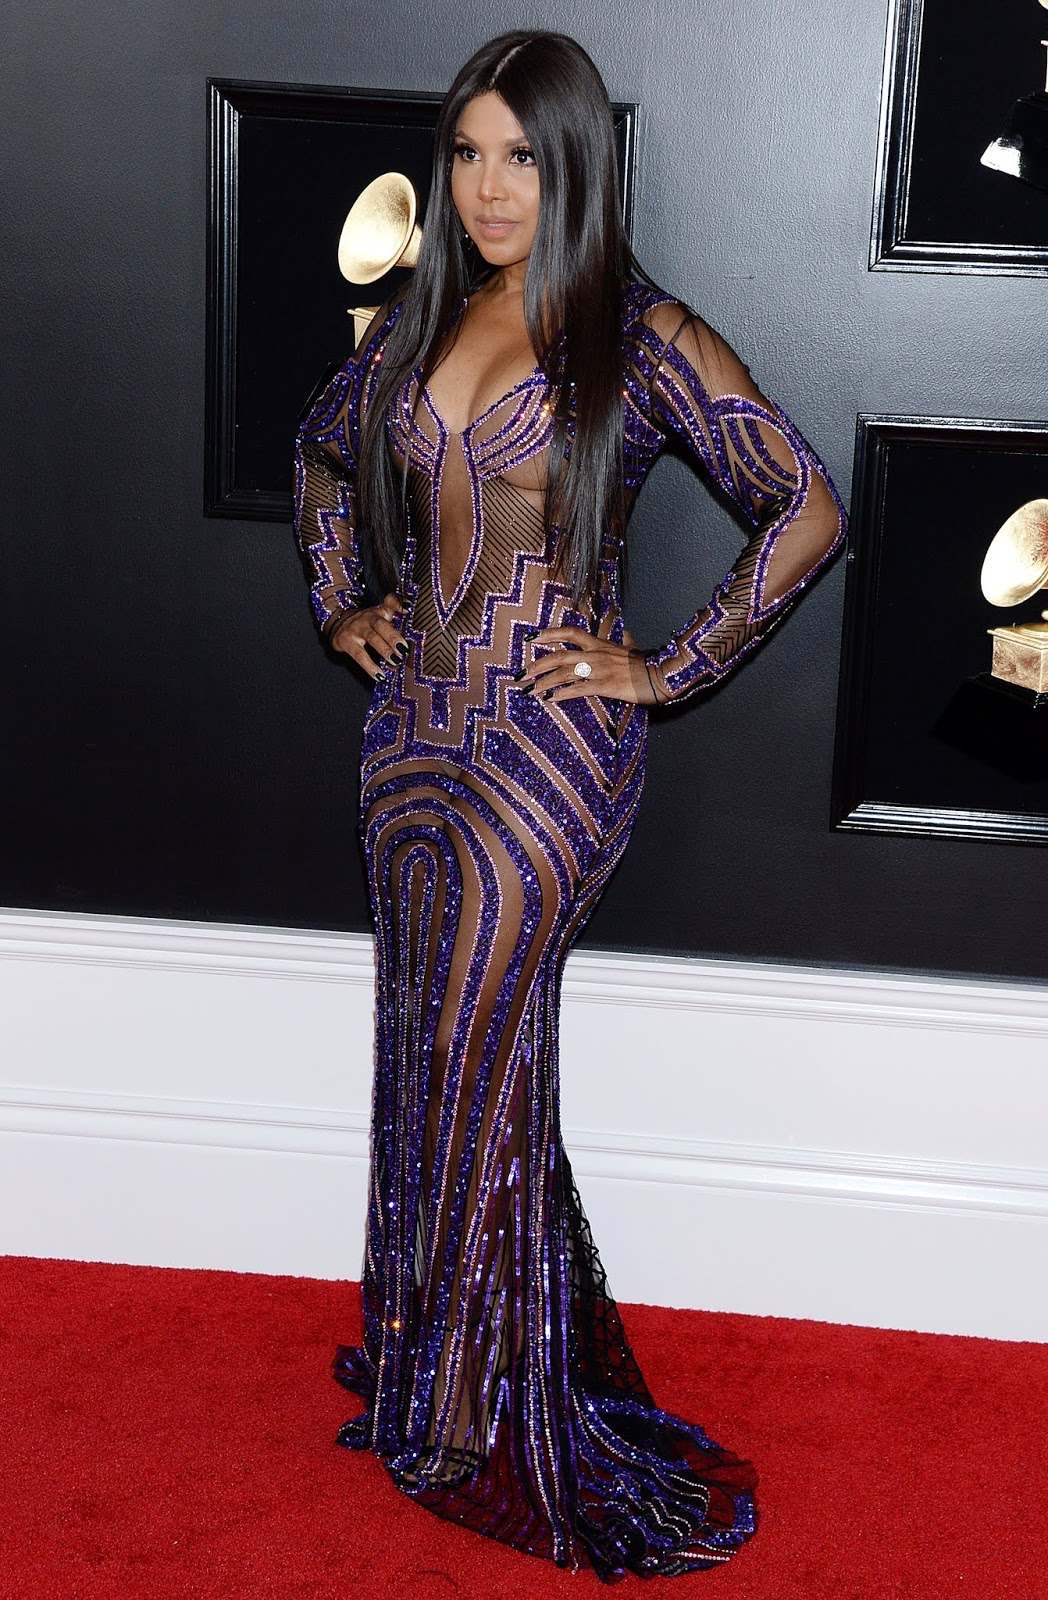 Toni Braxton – 61st Annual GRAMMY Awards in Los Angeles - 02/10/2019